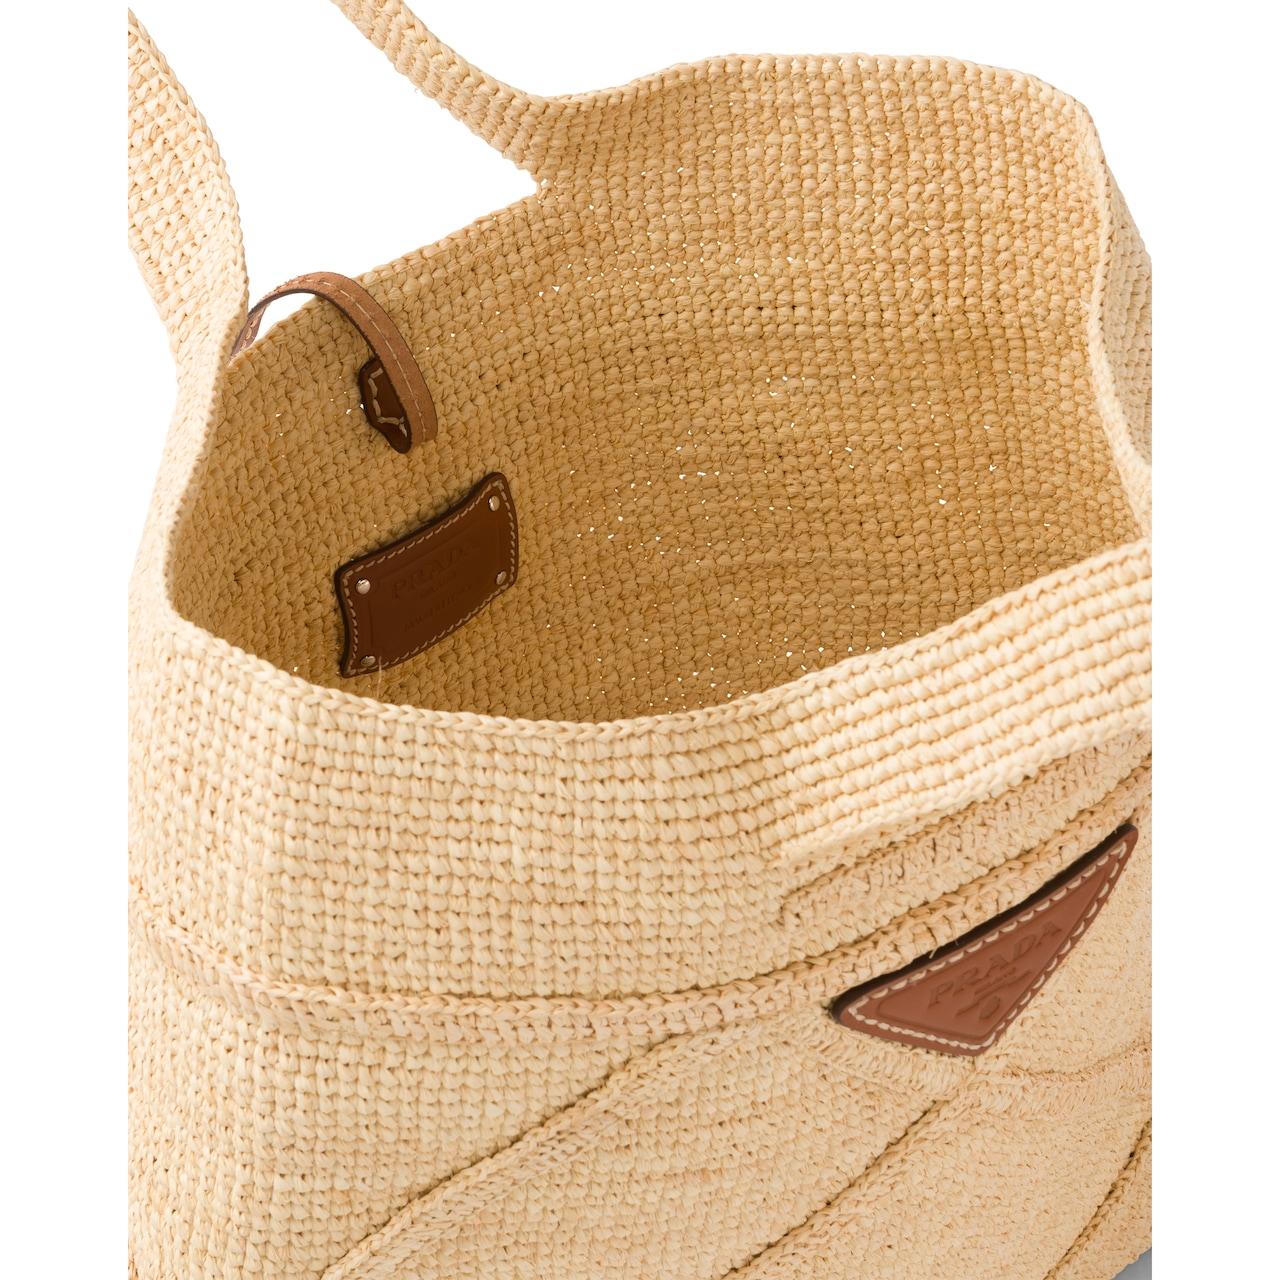 Prada 酒椰纤维手提包 5